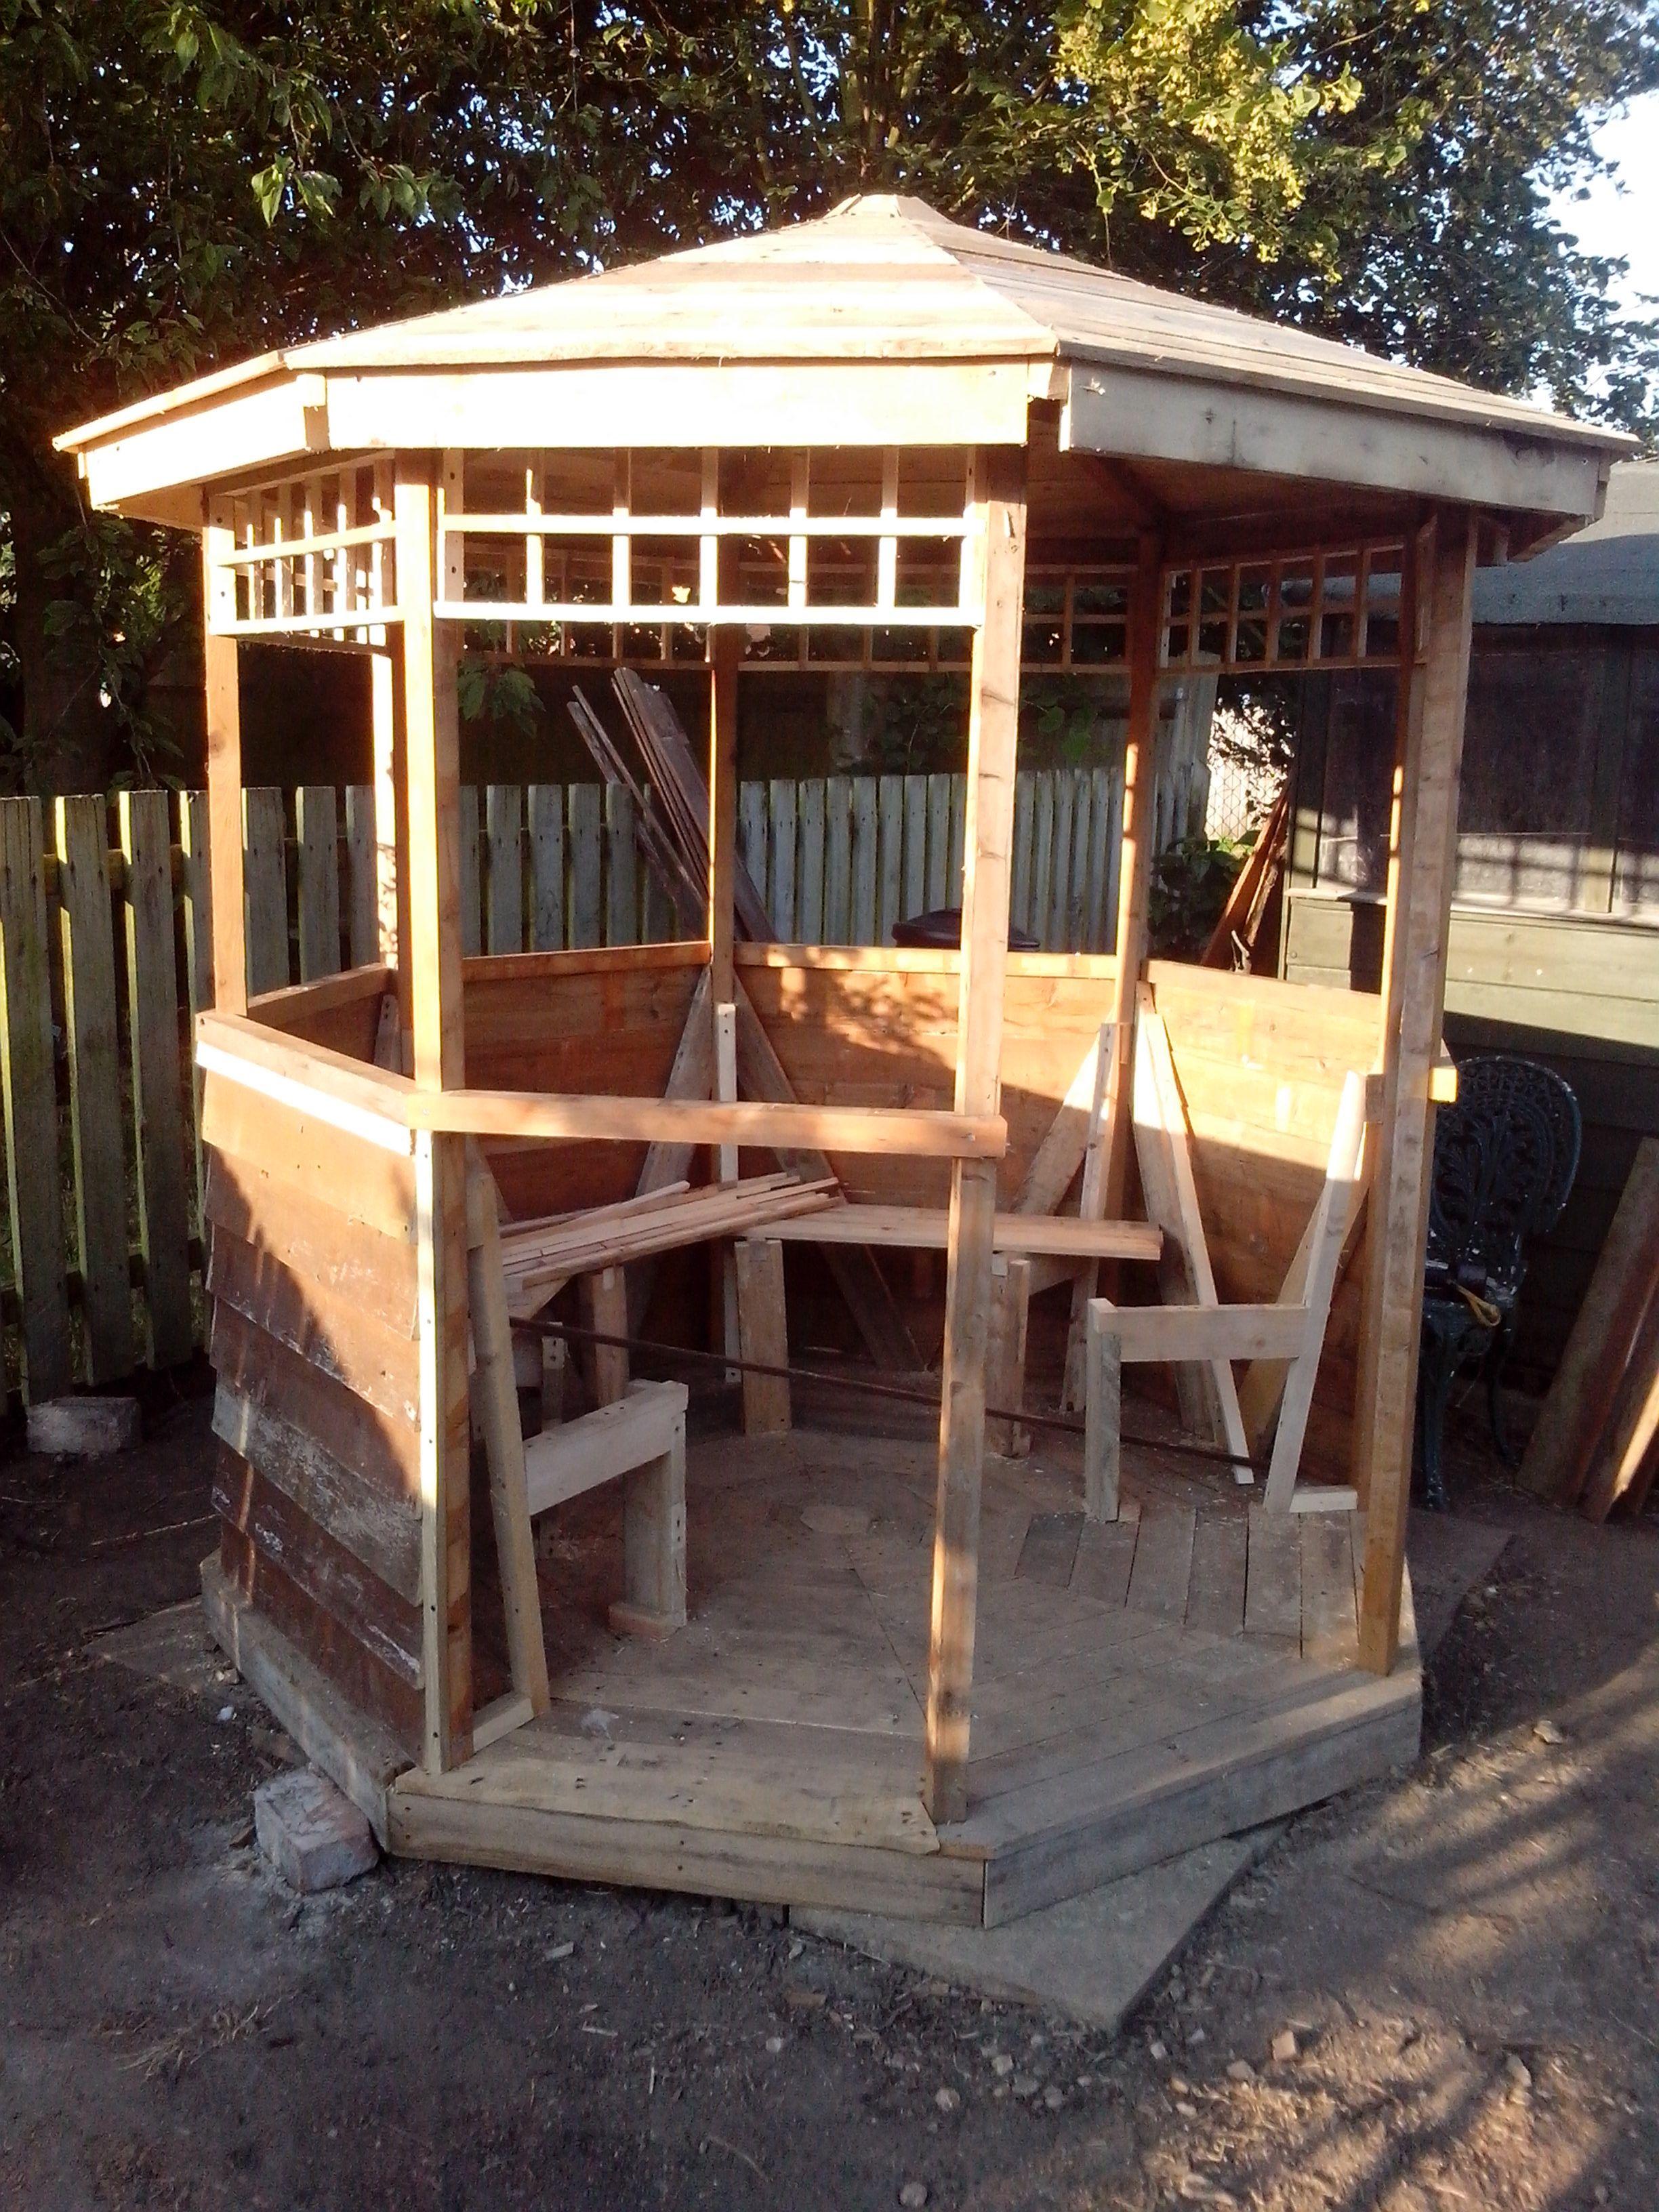 Building Gazebo Using Scrap Wood And Pallets Diy Yard Backyard